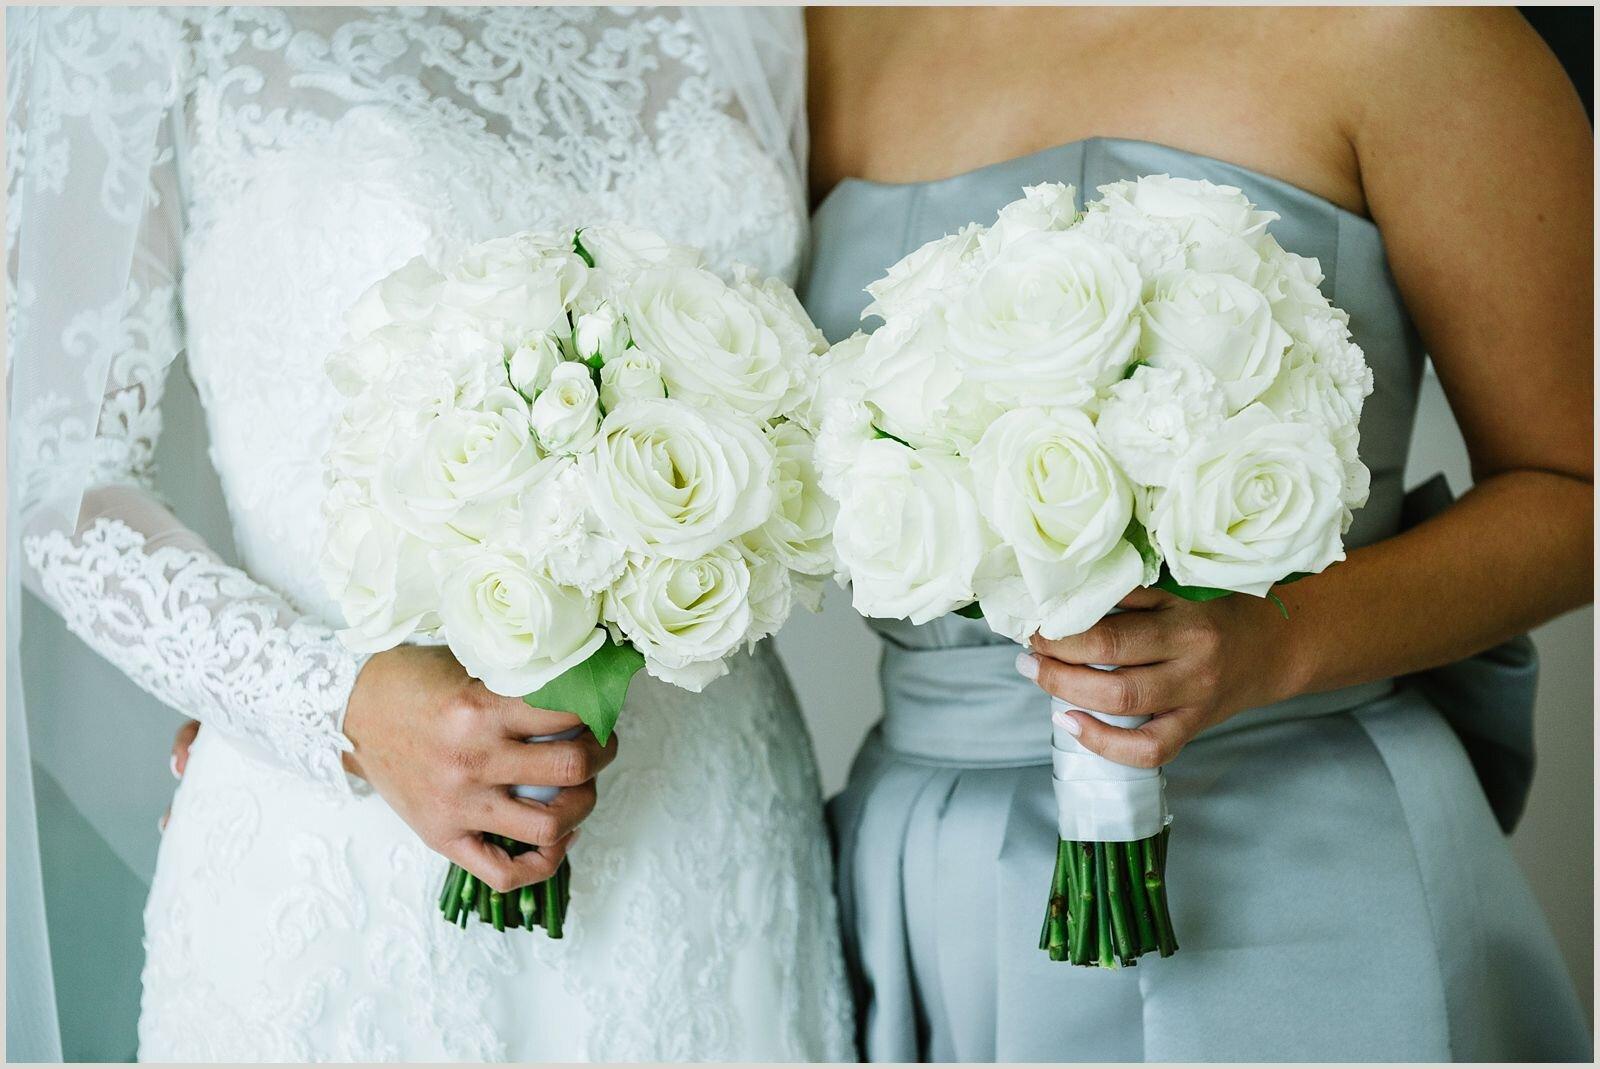 joseph_koprek_wedding_melbourne_the_prince_deck_0013.jpg